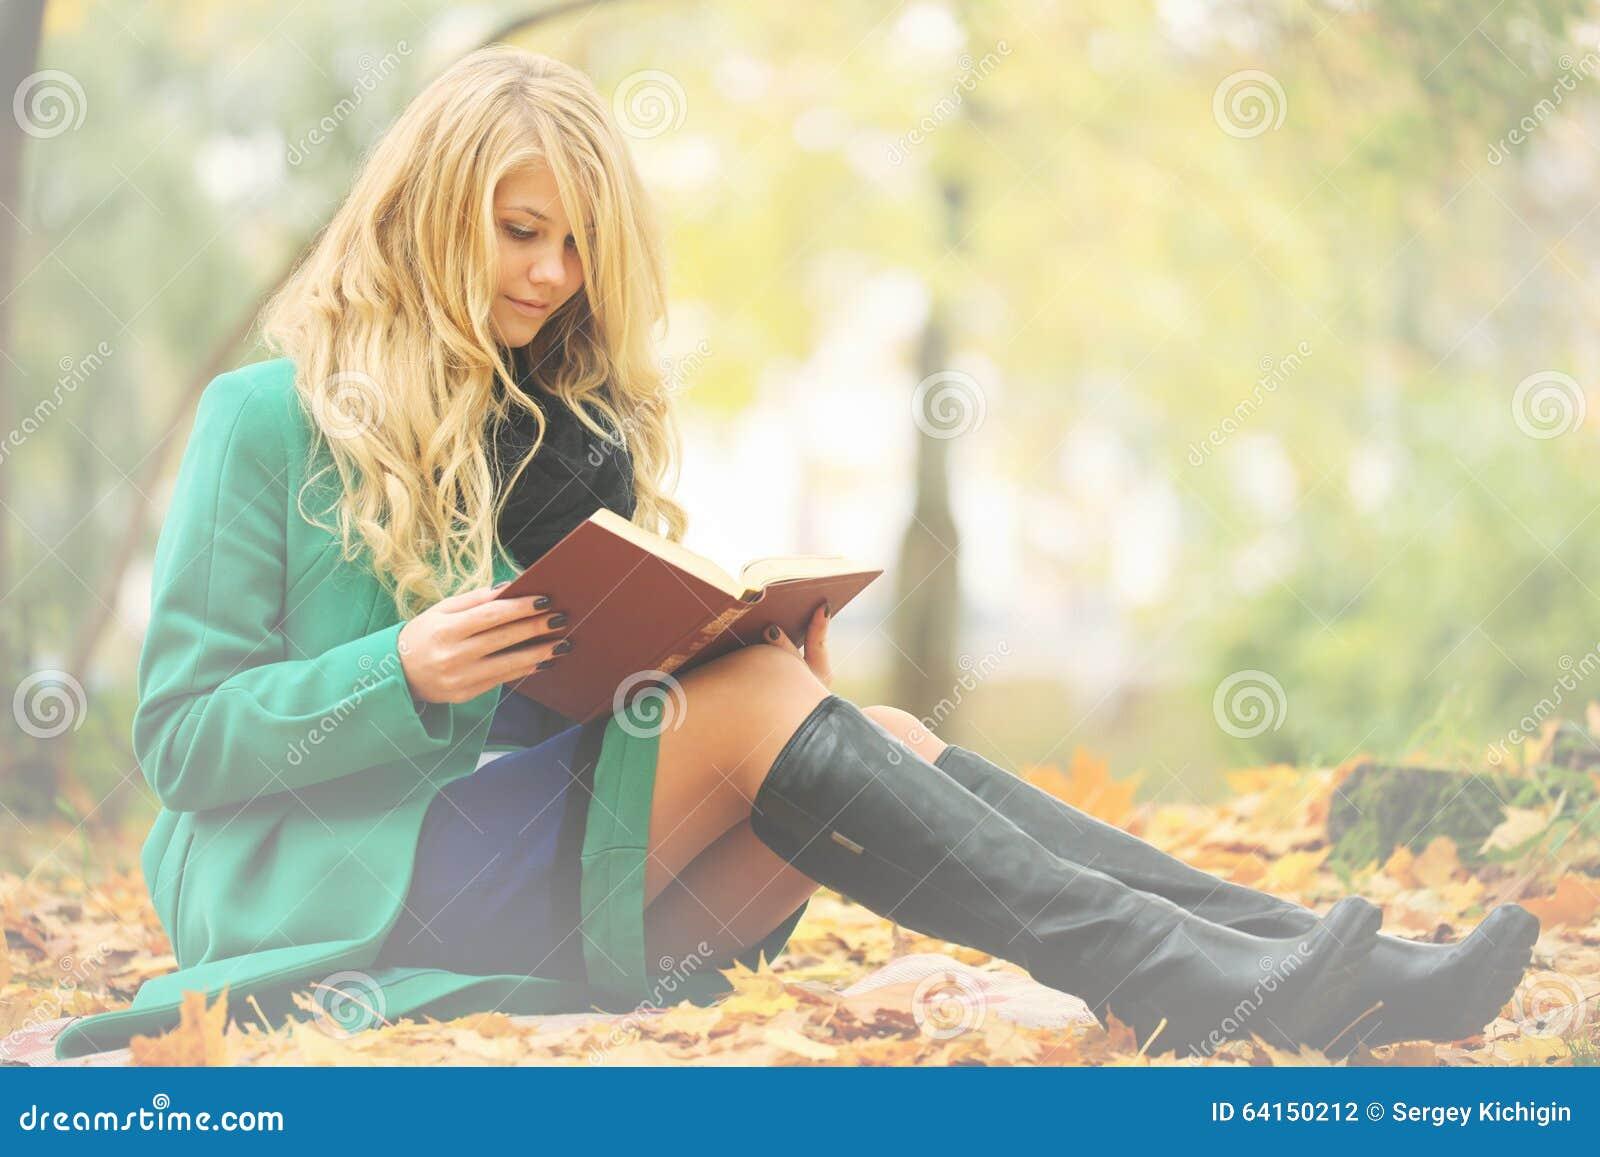 Girl reading book in autumn park